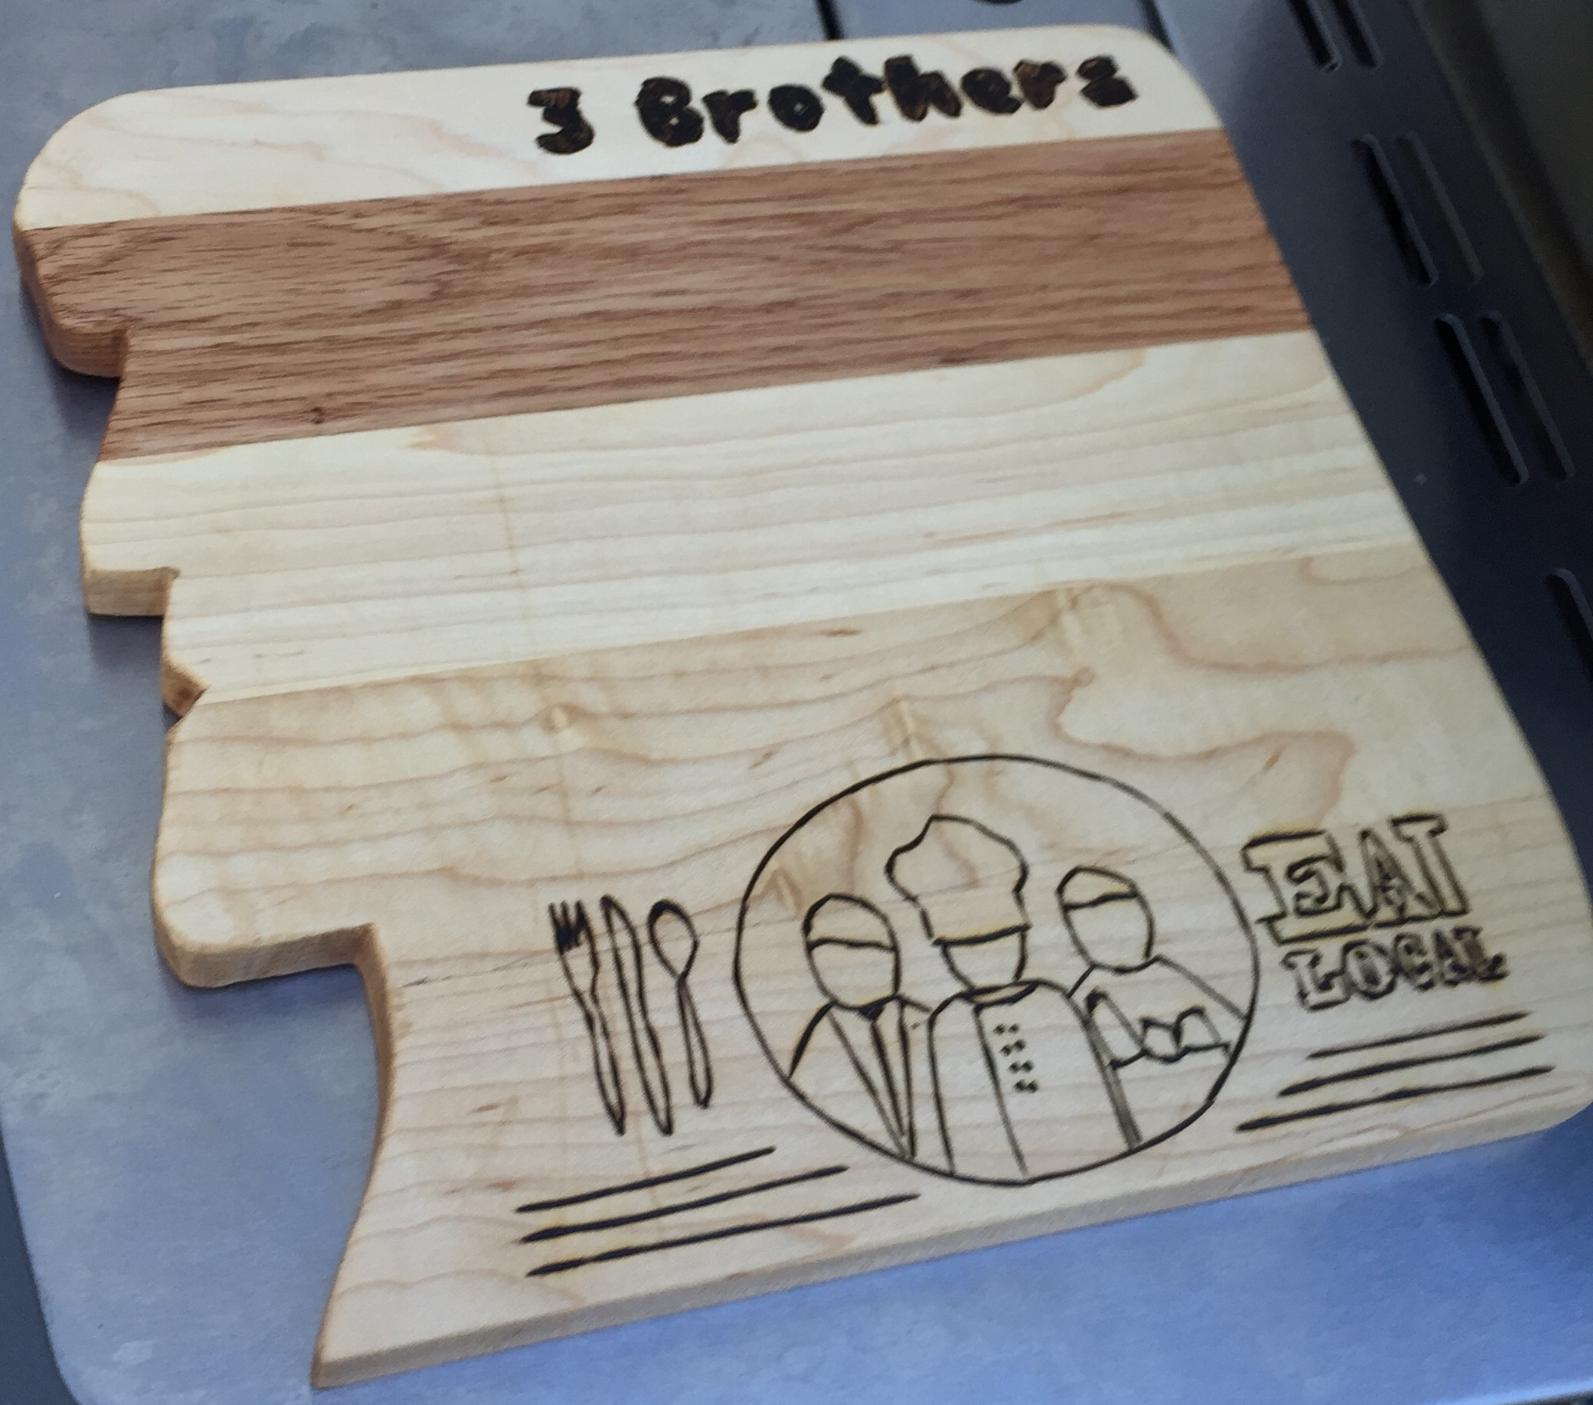 Three Brothers Marketplace Cutting Board